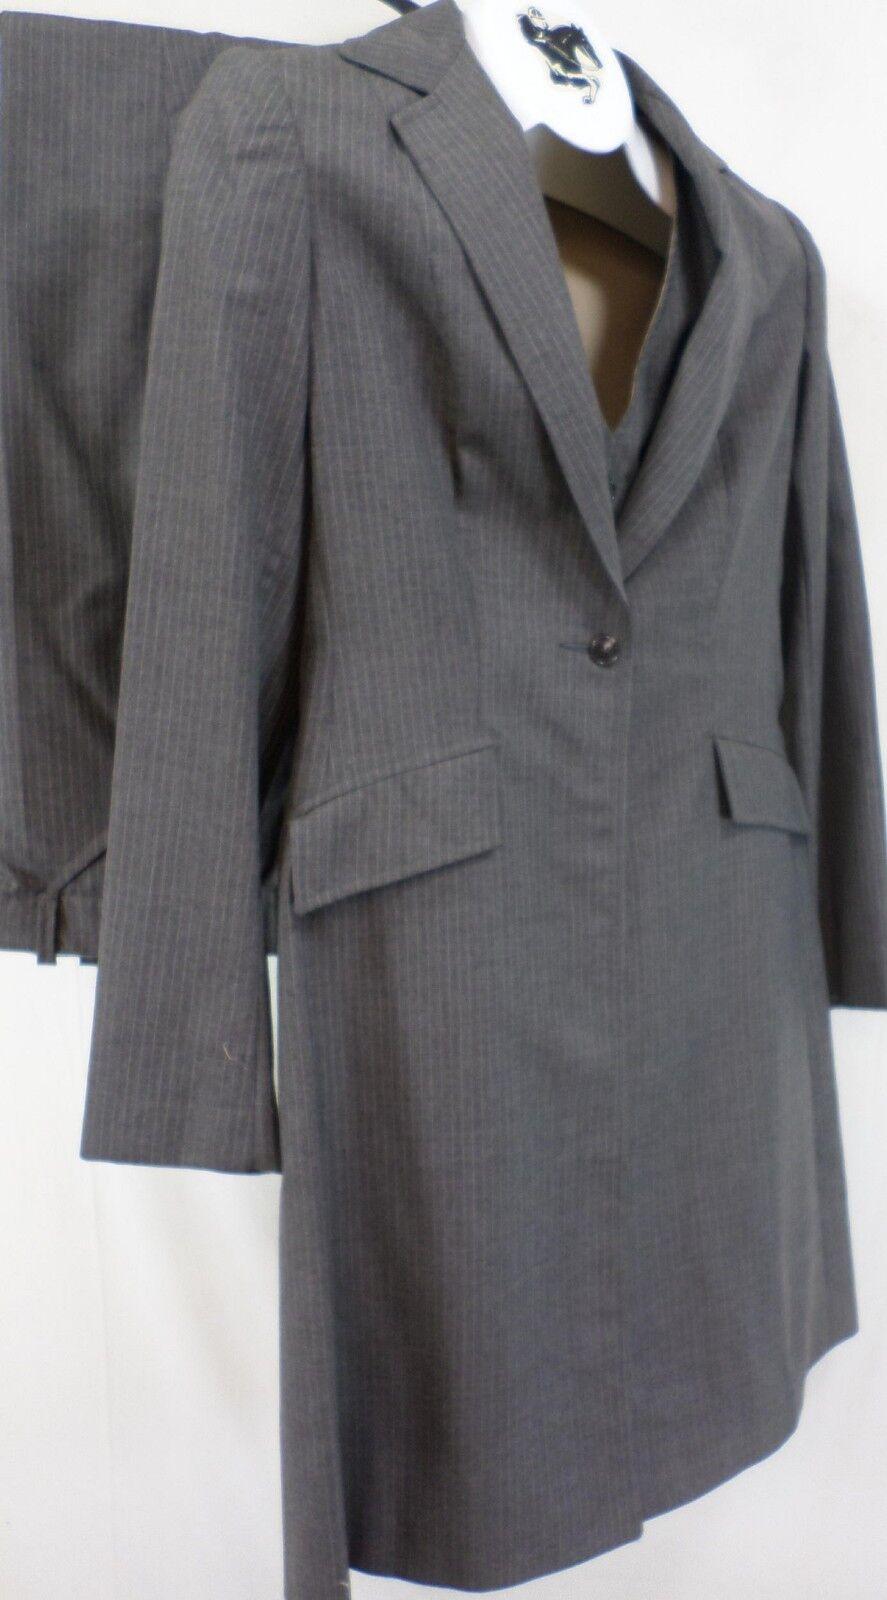 Reed Hill Ladies Saddleseat suit 3 pc Medium Brown wool blend 18 - Made in USA